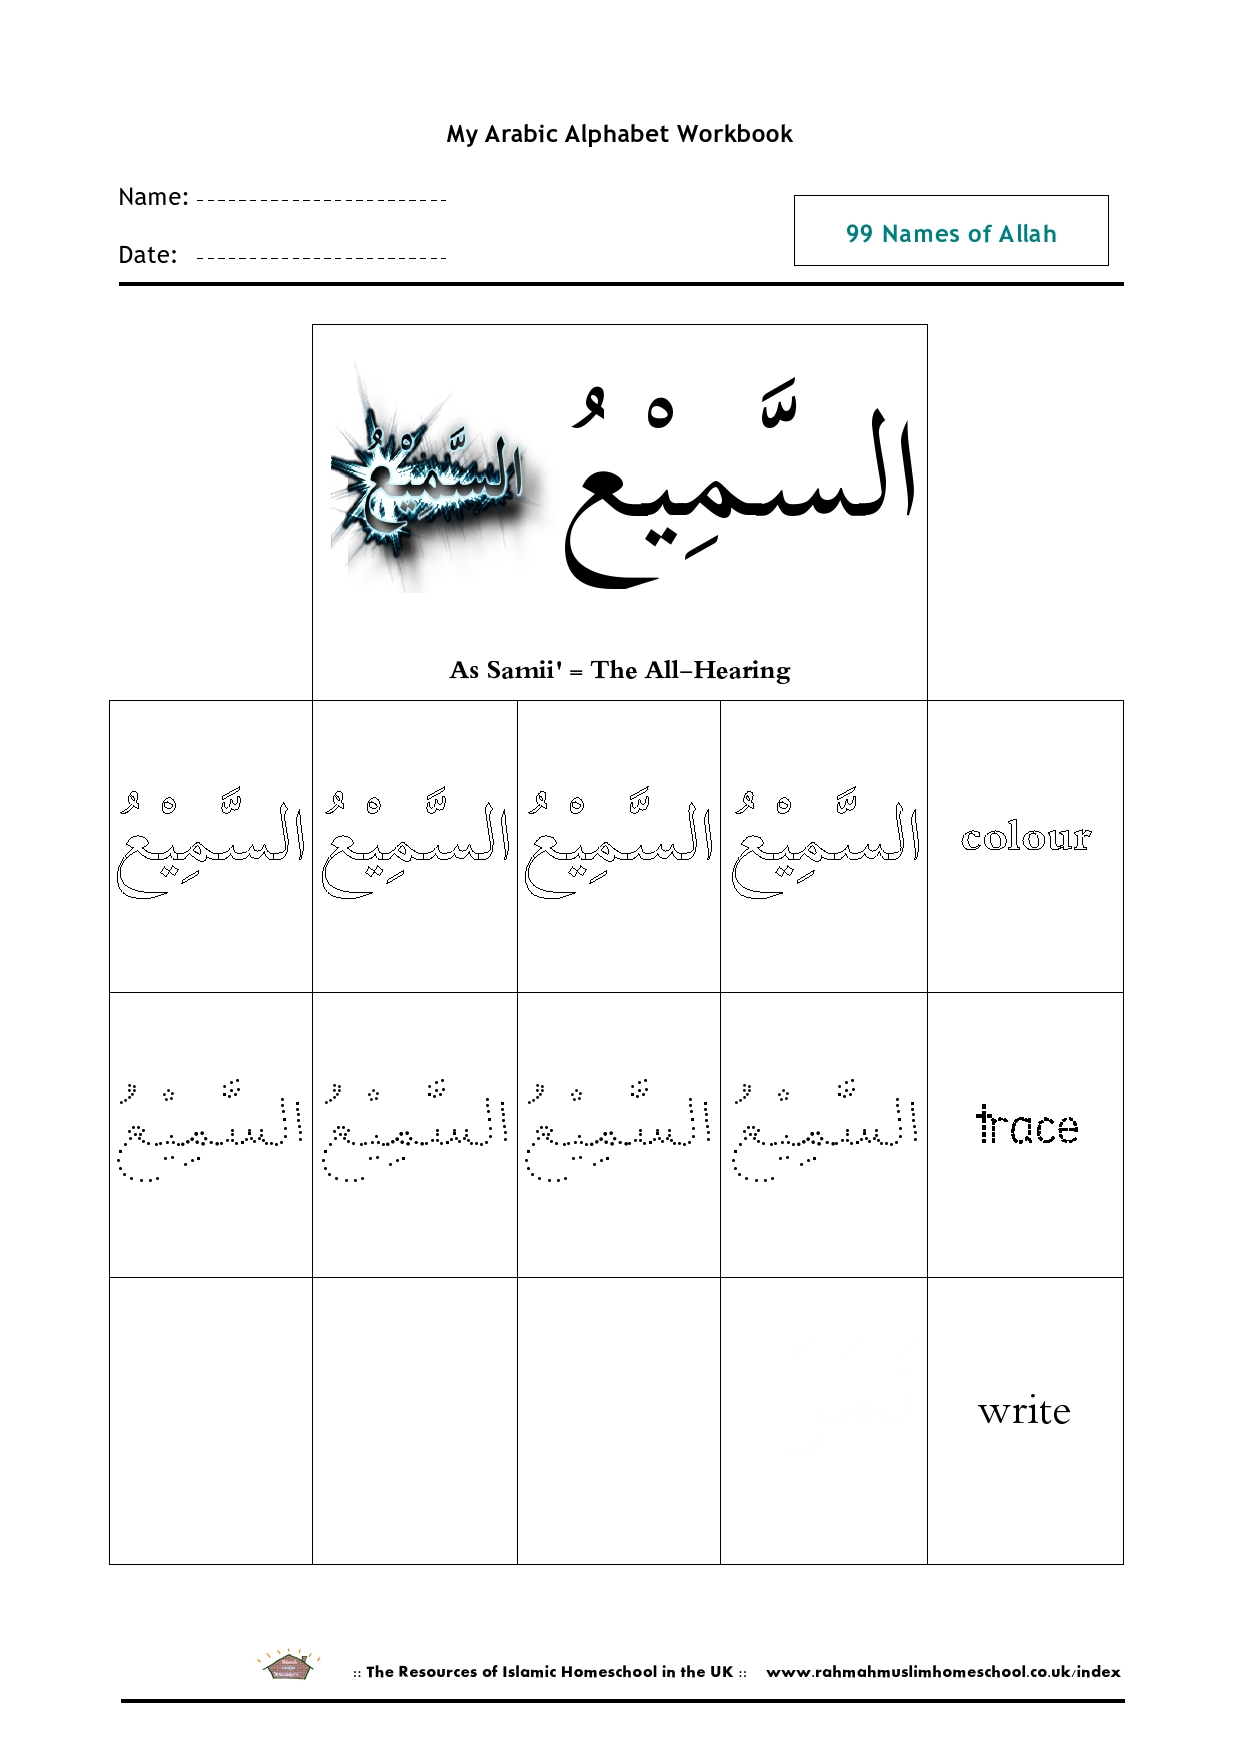 Free Arabic Worksheet The 99 Names Of Allah As Samii